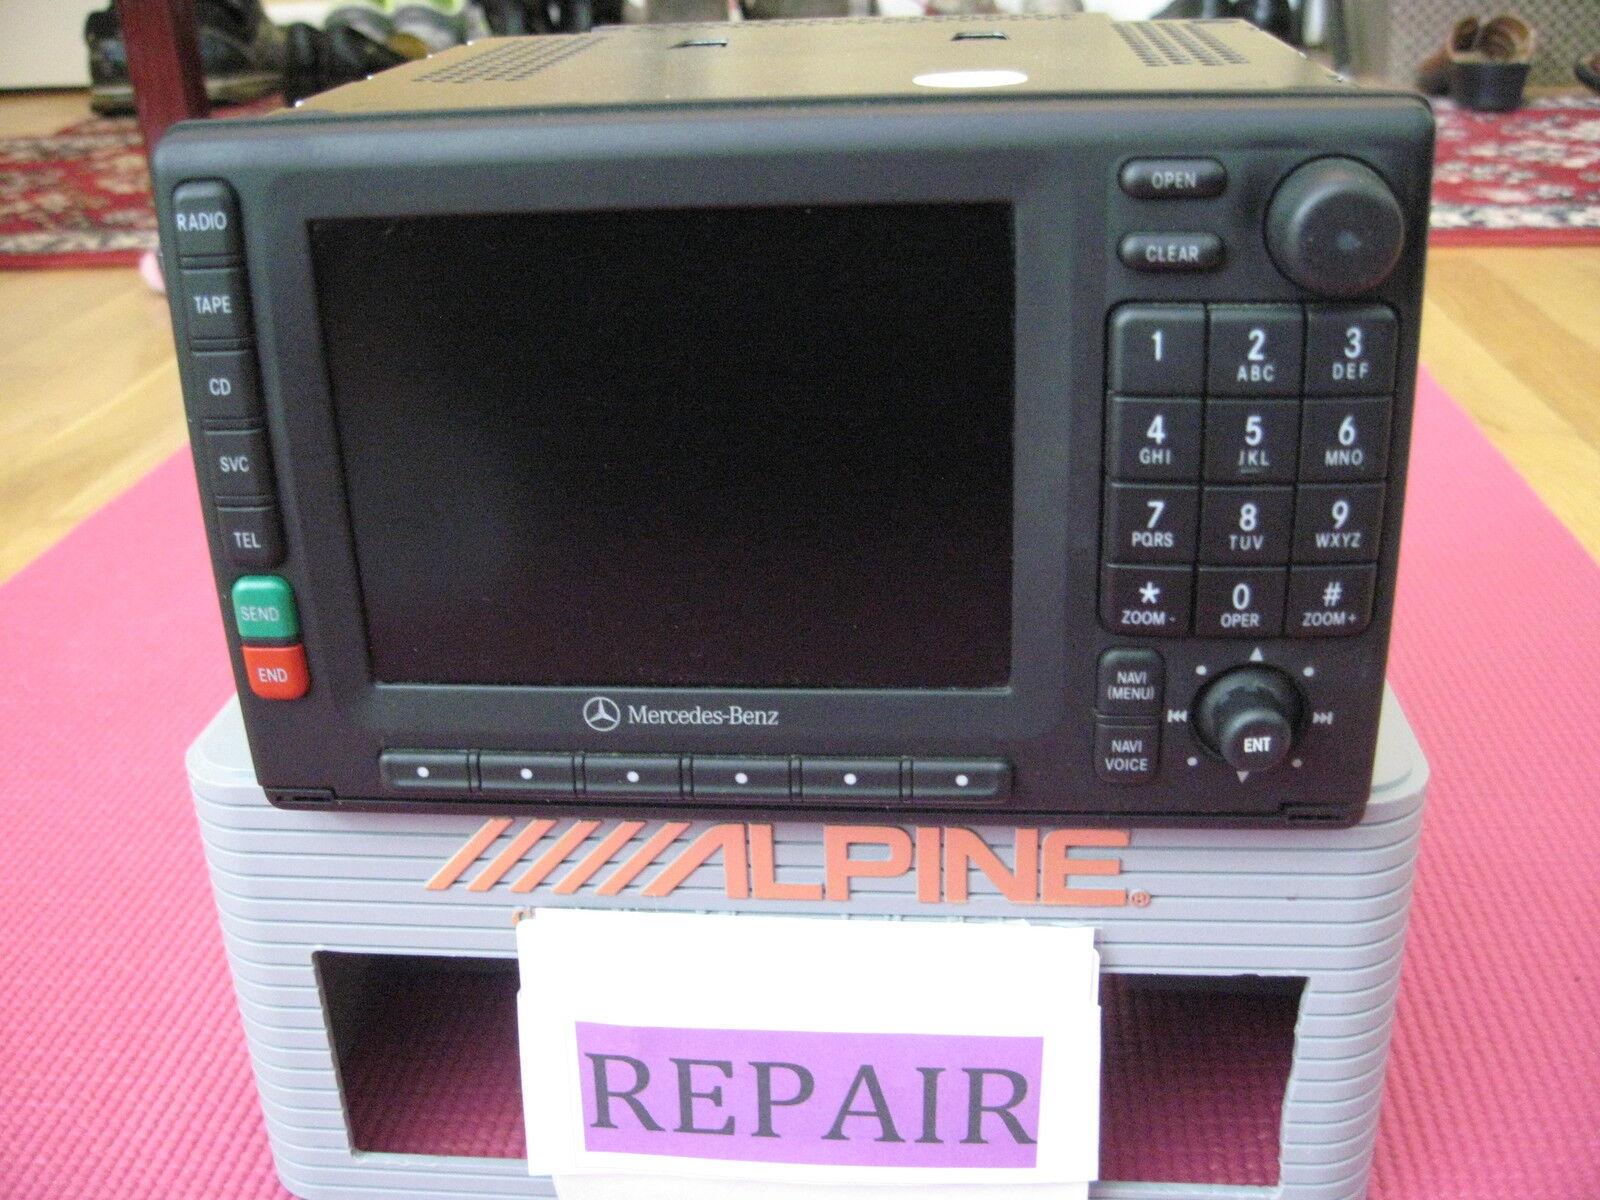 Mercedes benz ml500 ml350 ml320 comand radio we repair for Mercedes benz ml320 radio code